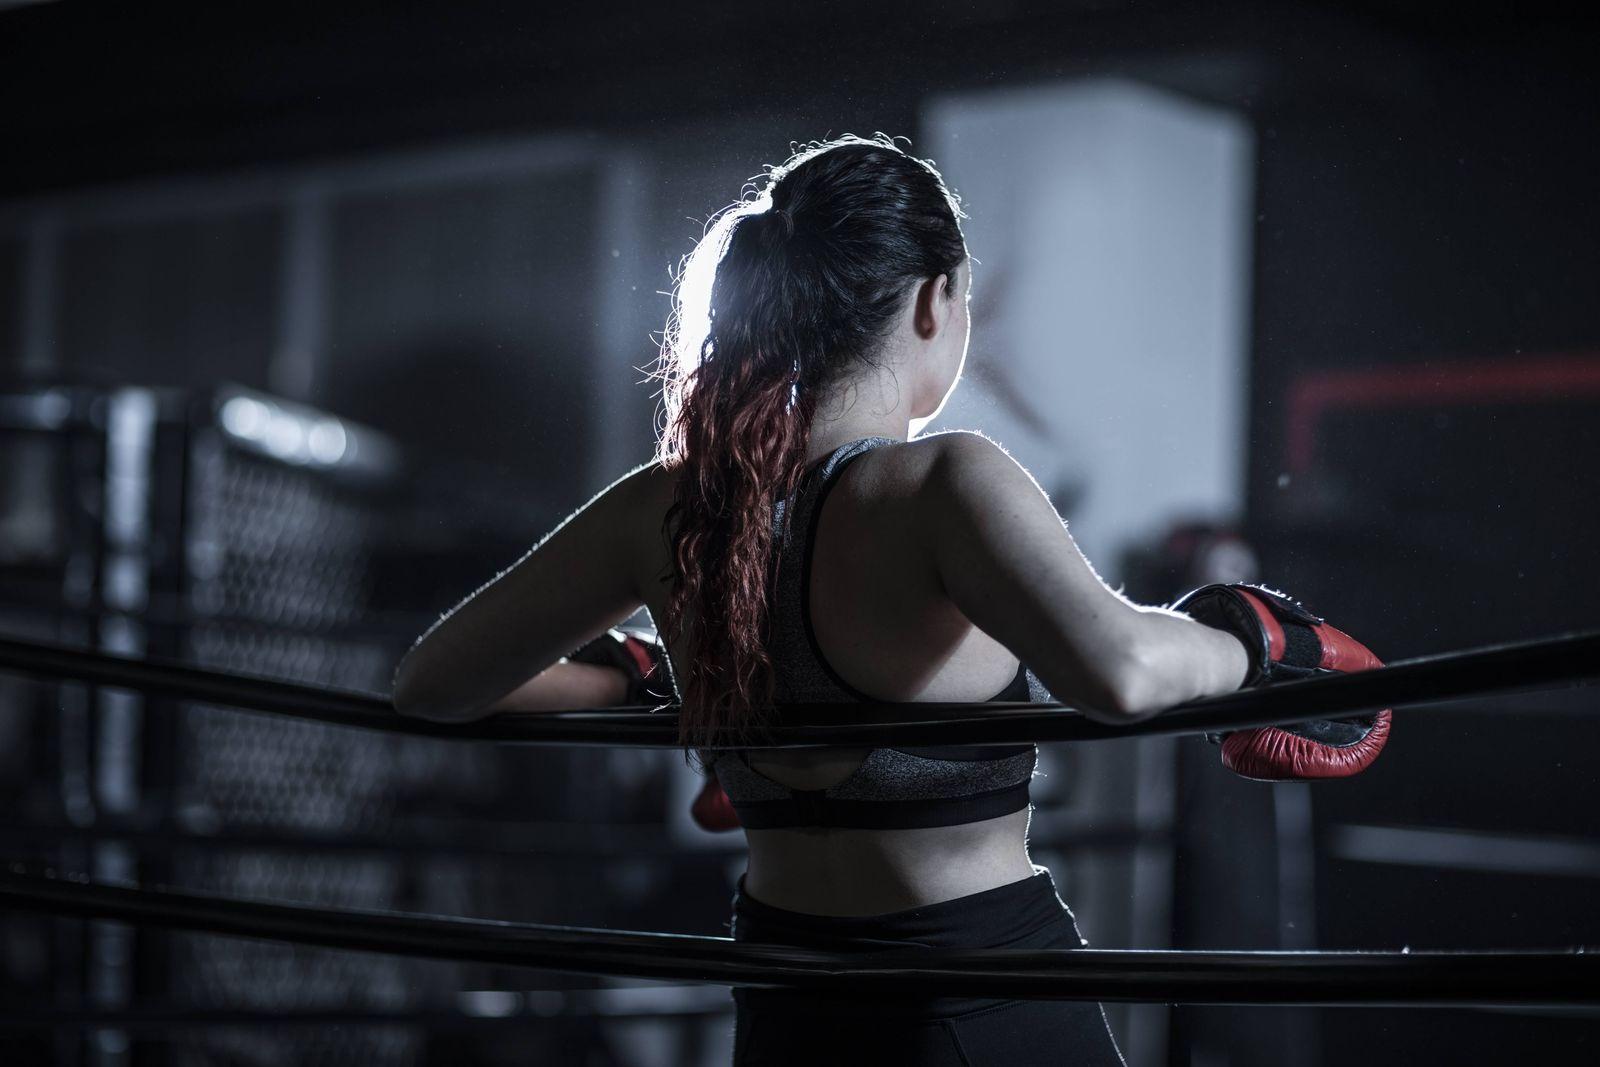 Female boxer in boxing ring model released Symbolfoto property released PUBLICATIONxINxGERxSUIxAUTxH